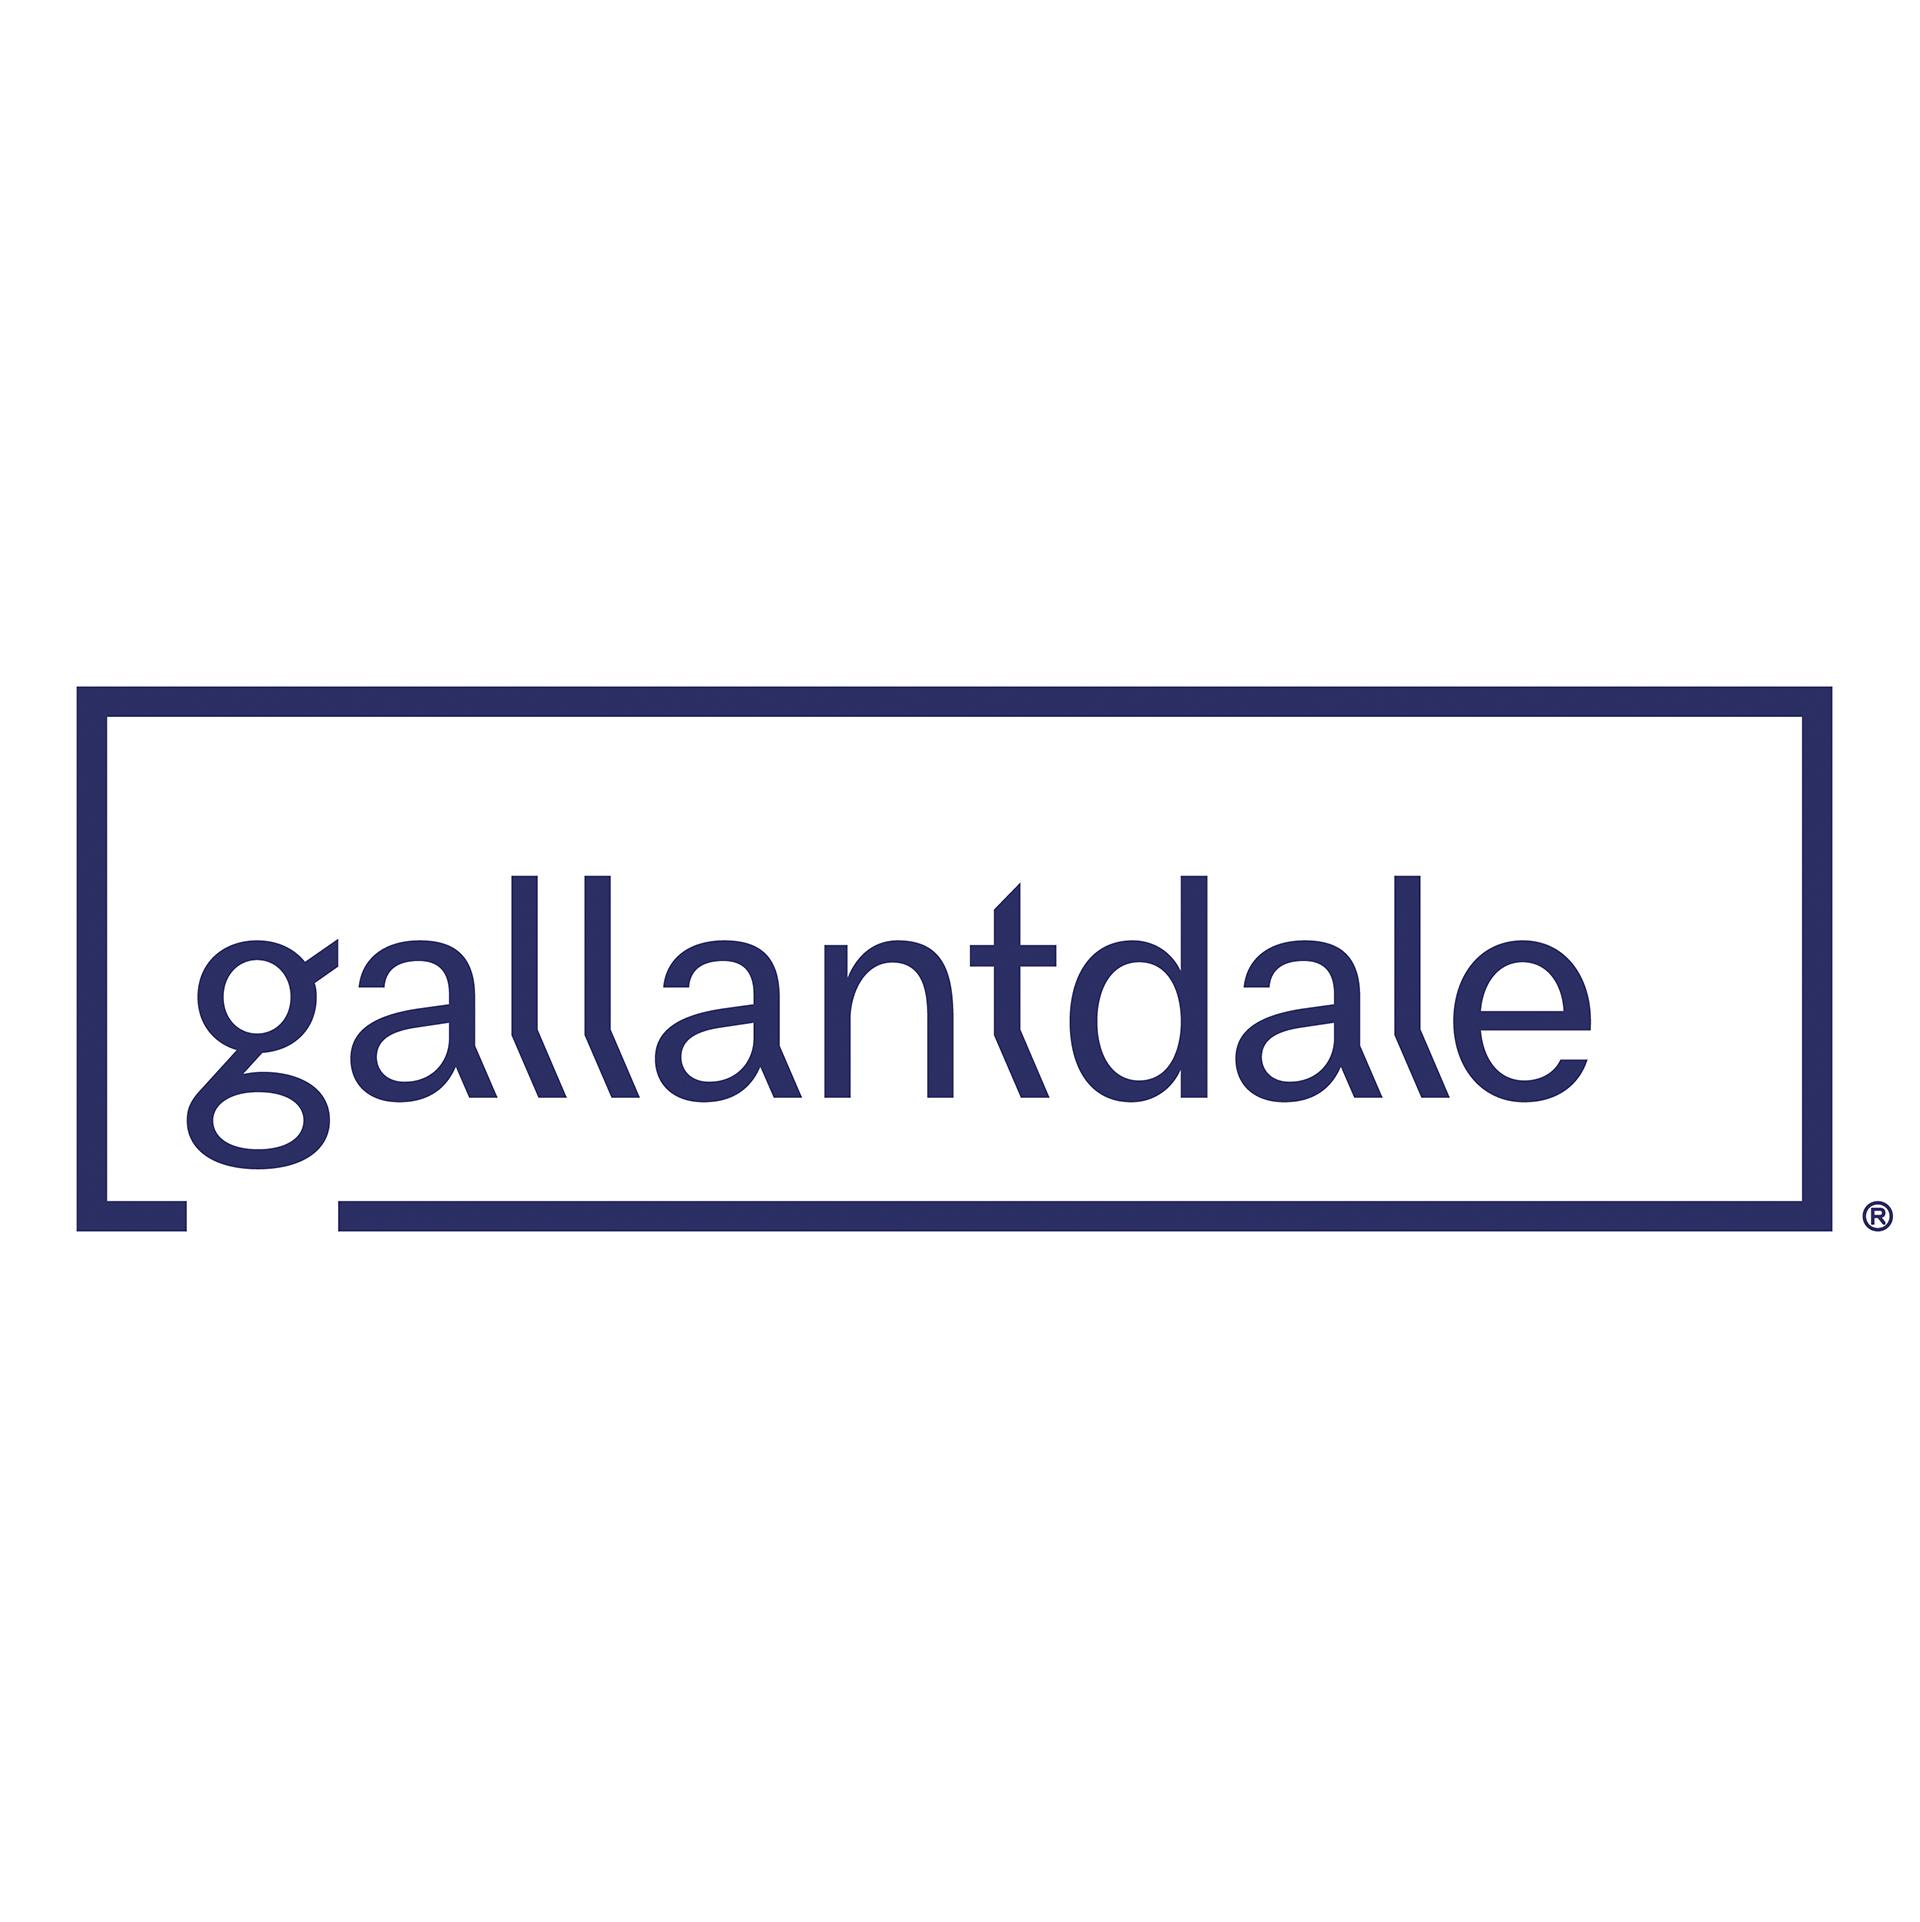 GALLANTDALE